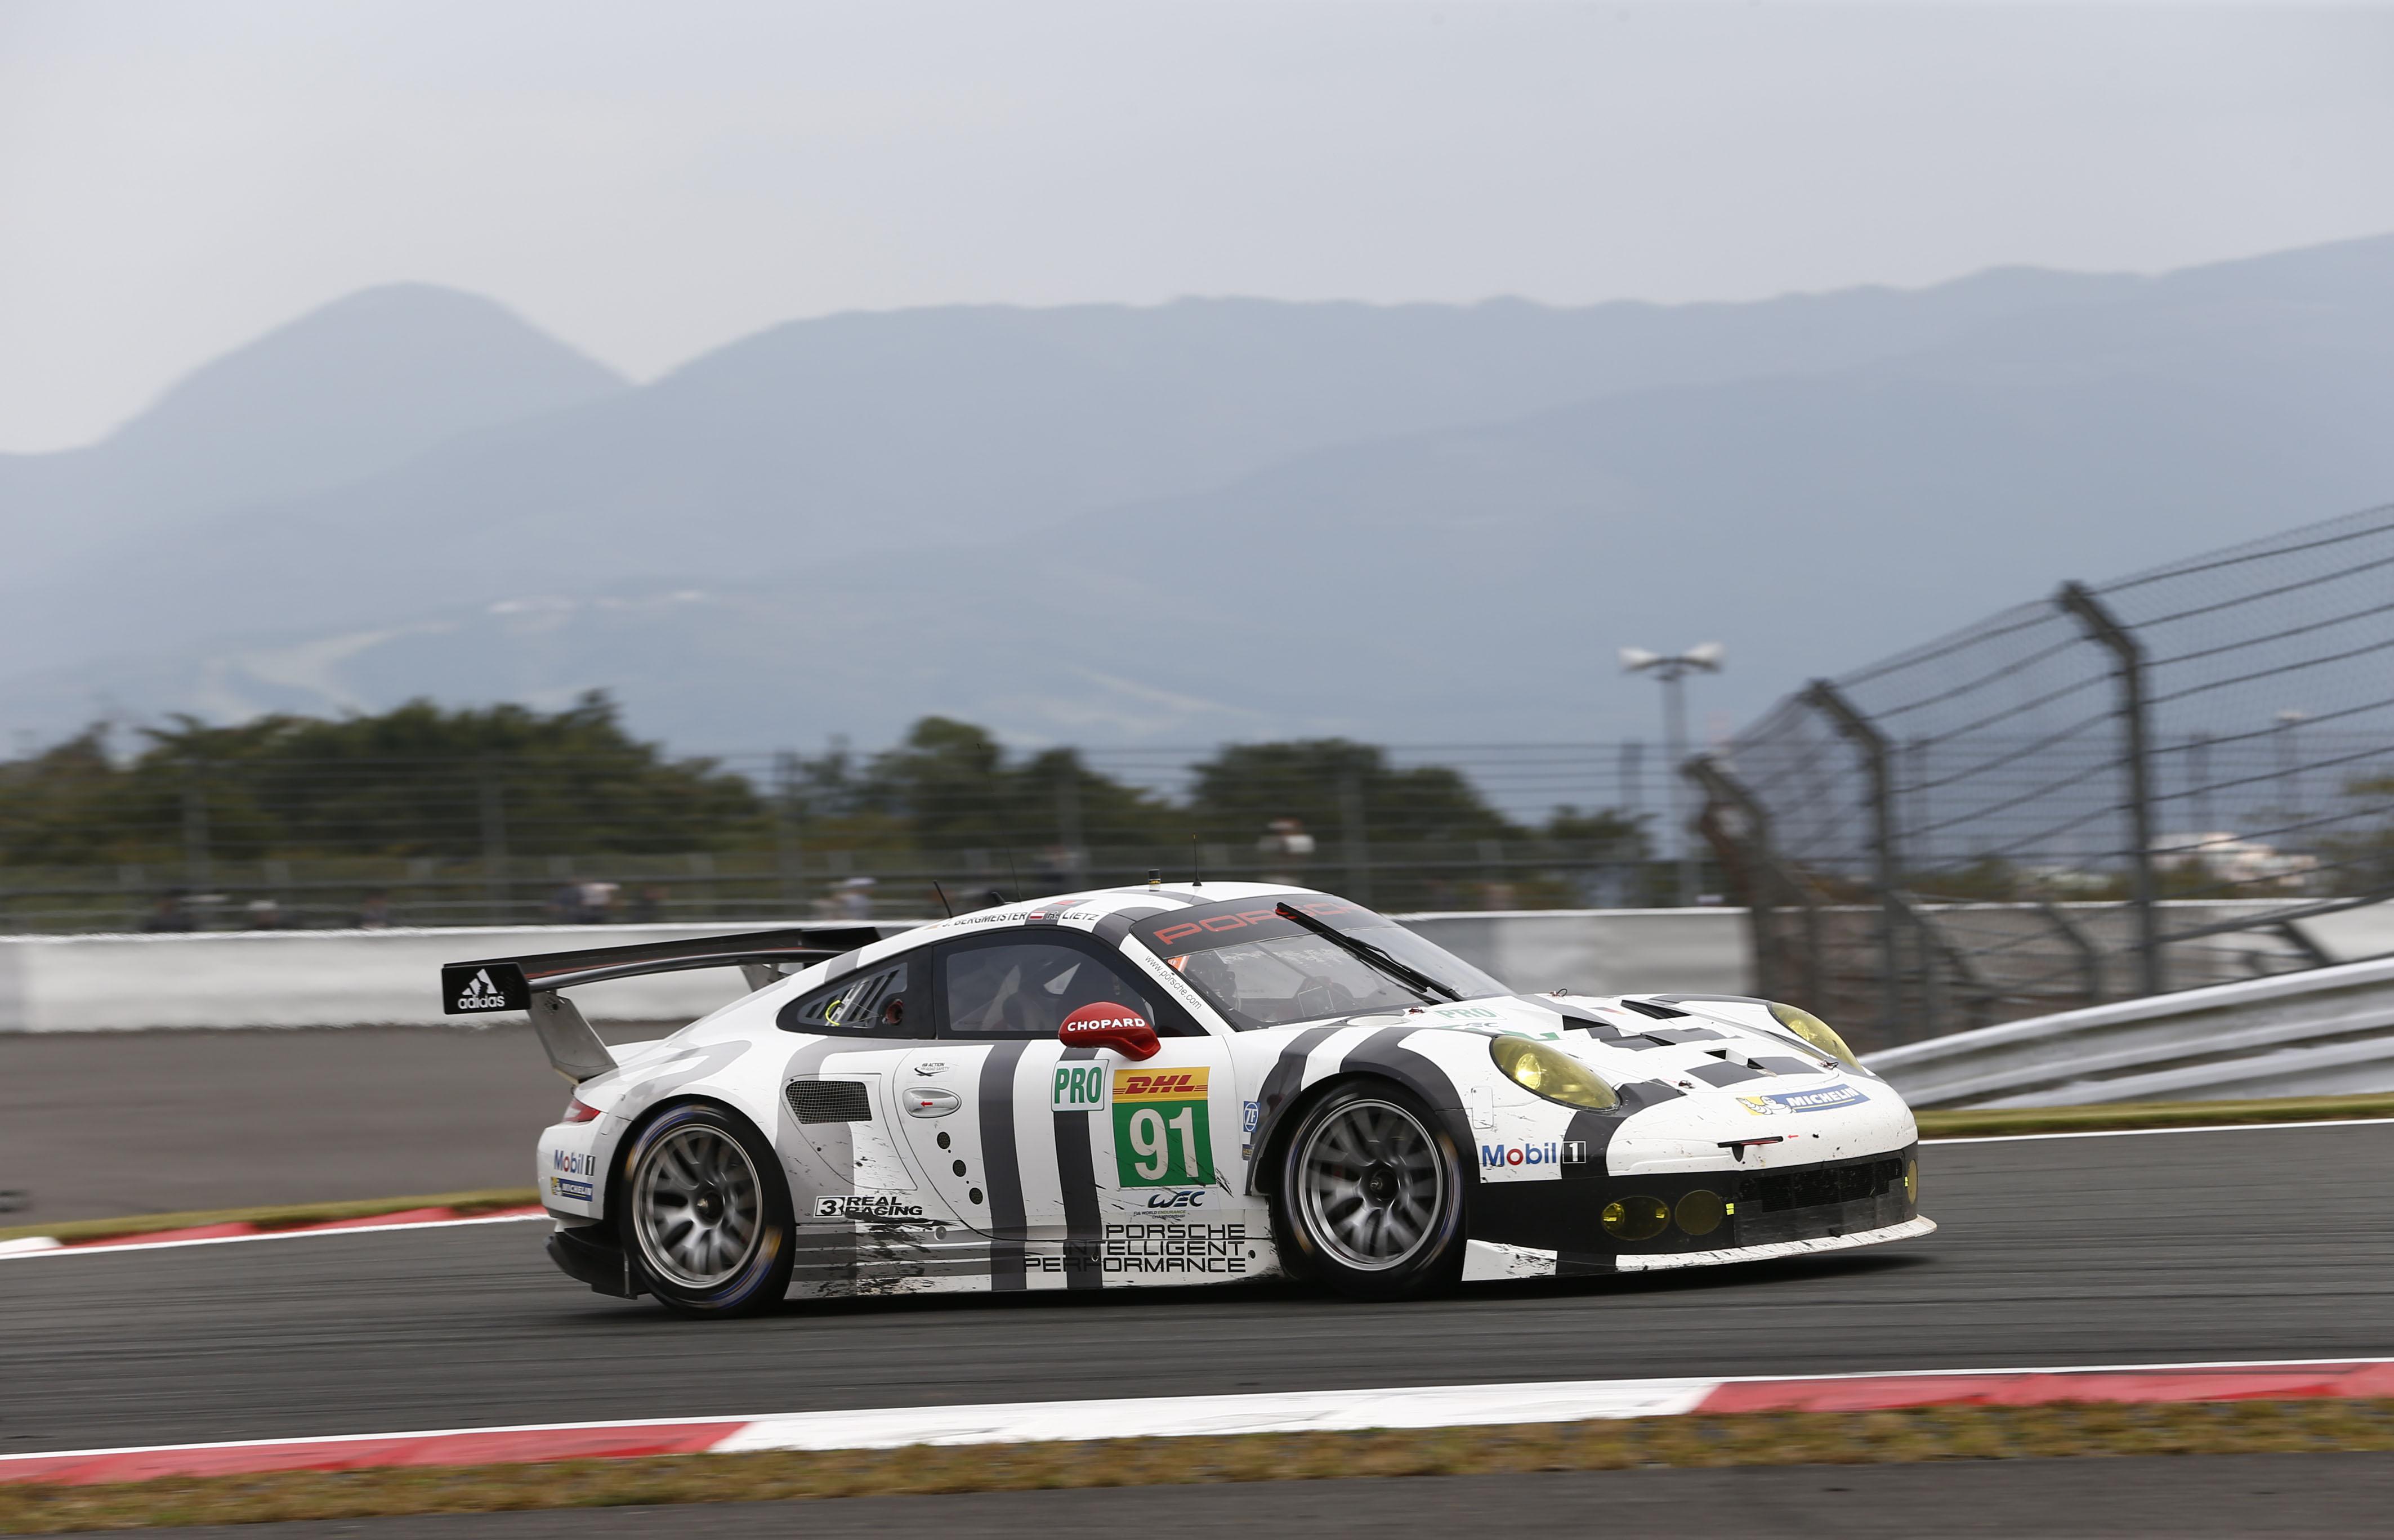 Porsche 911 RSR, Porsche Team Manthey: Joerg Bergmeister, Richard Lietz